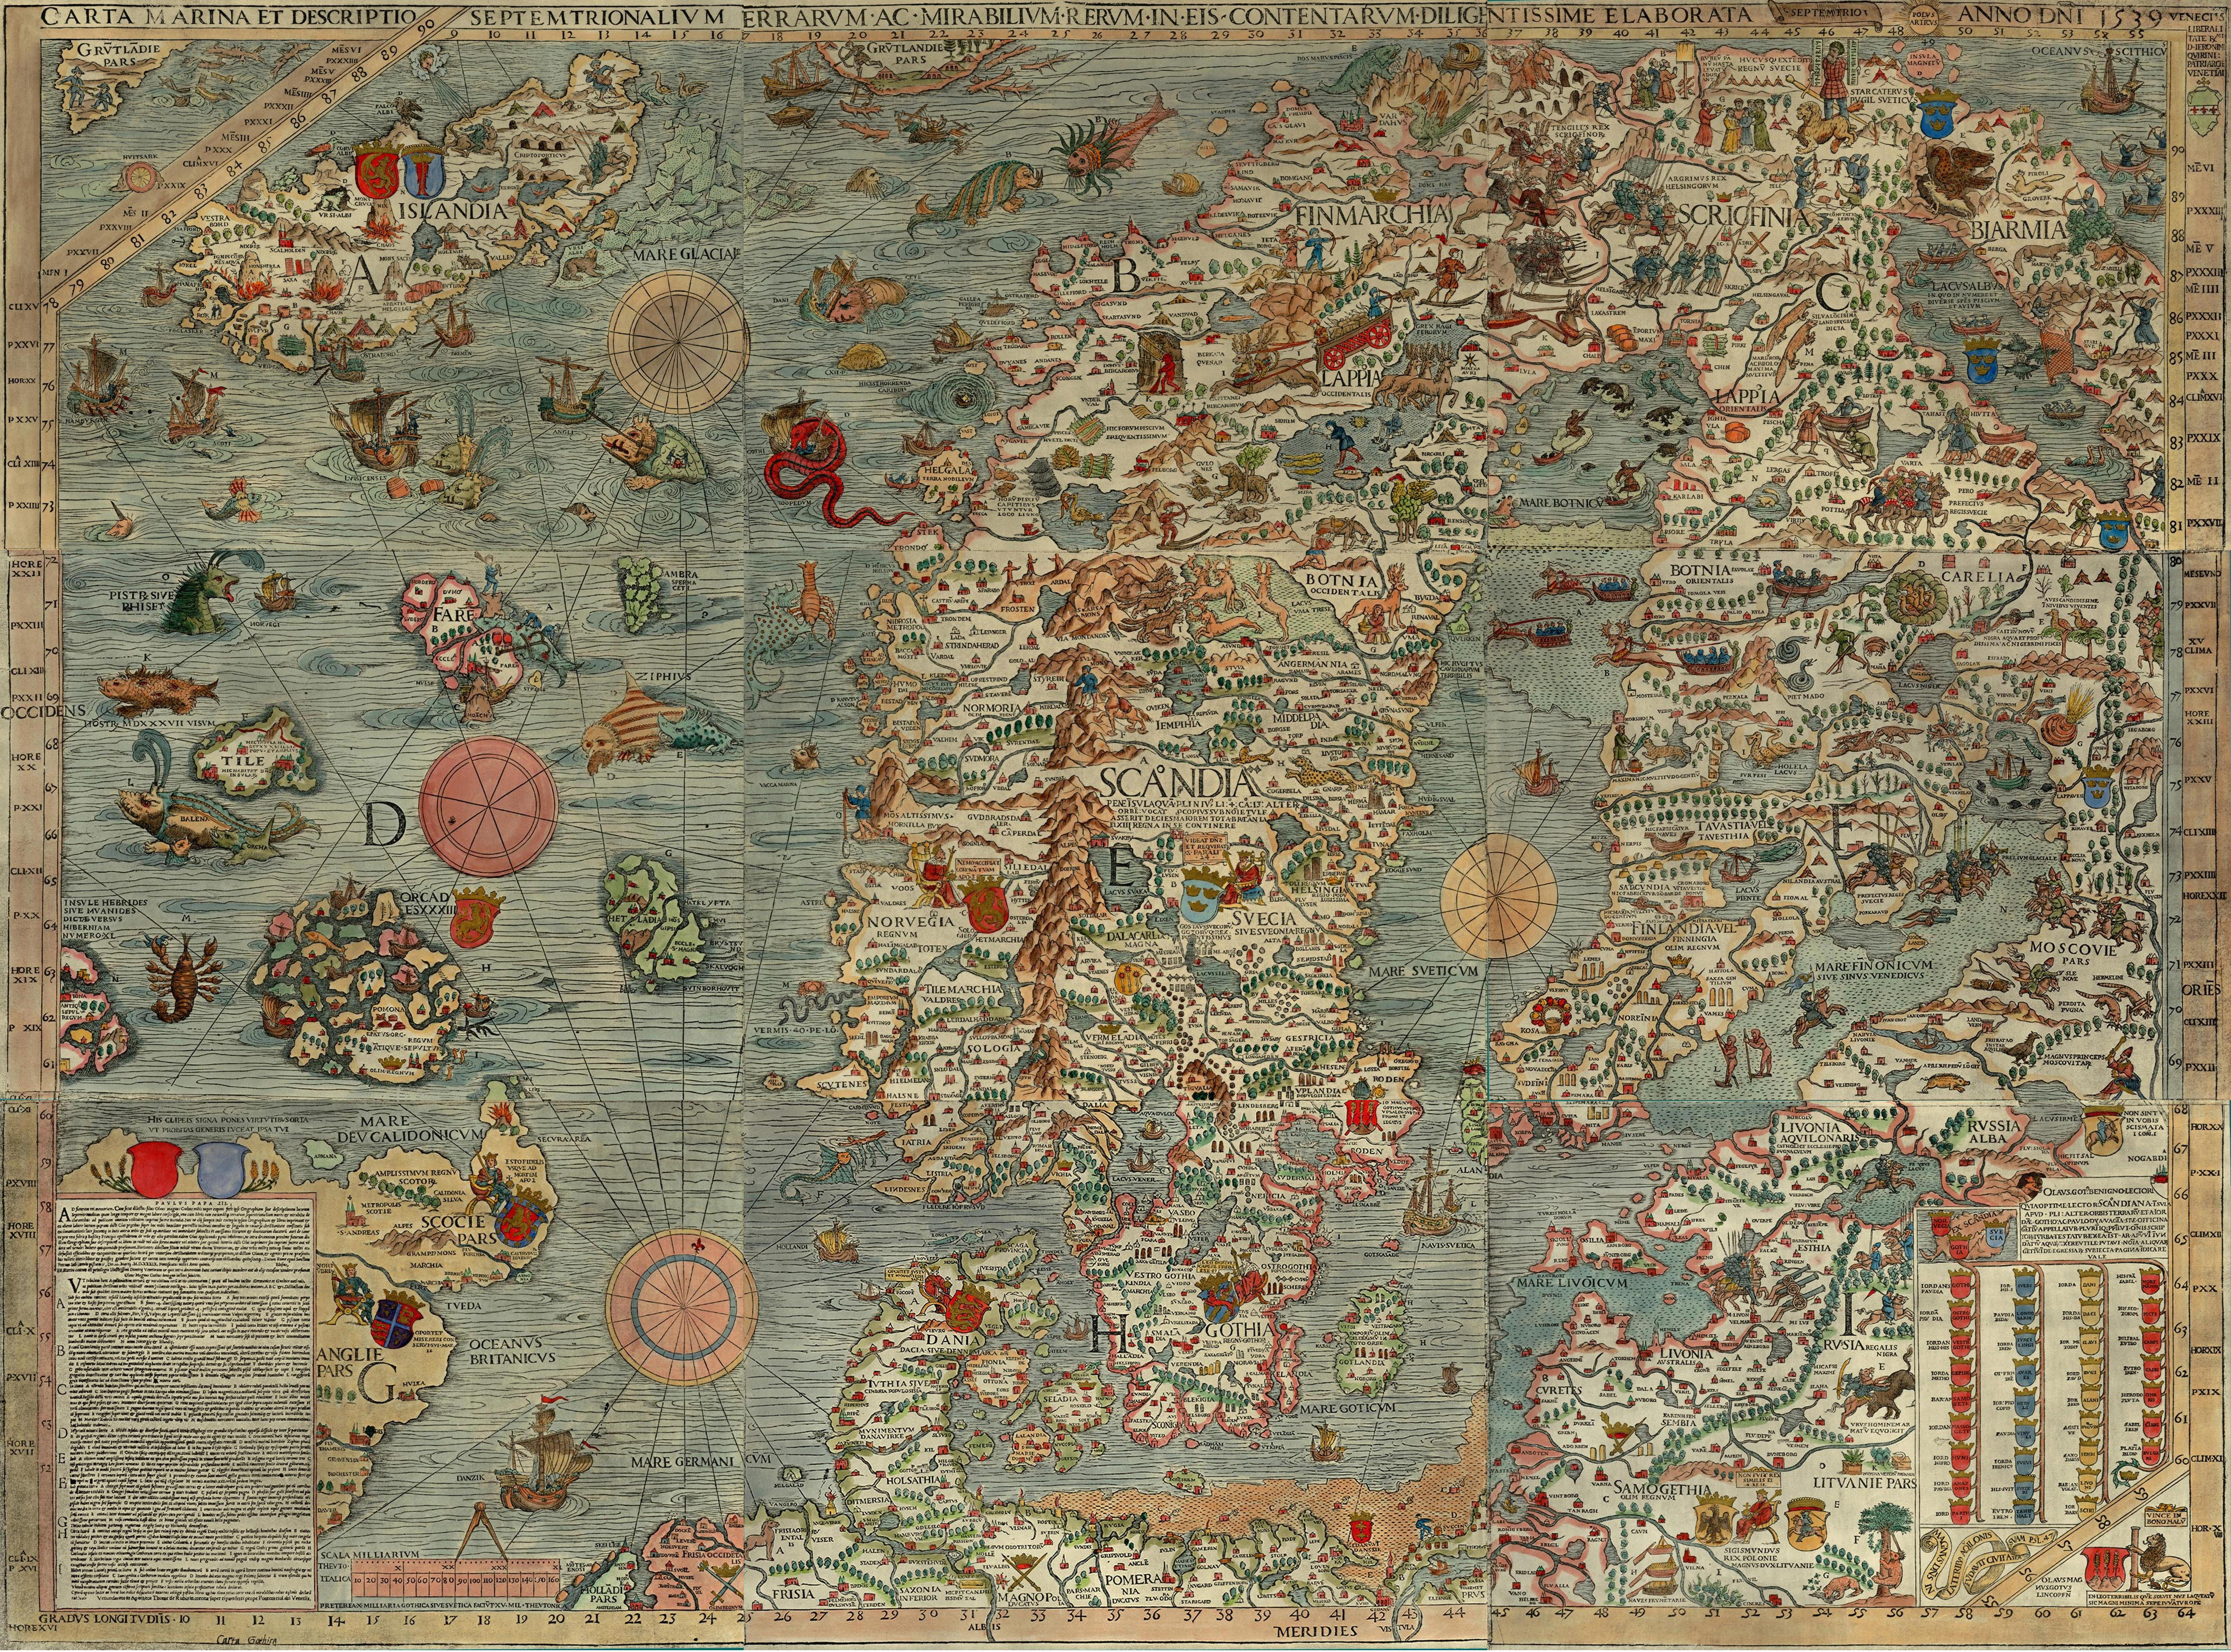 Scandinavia 1539